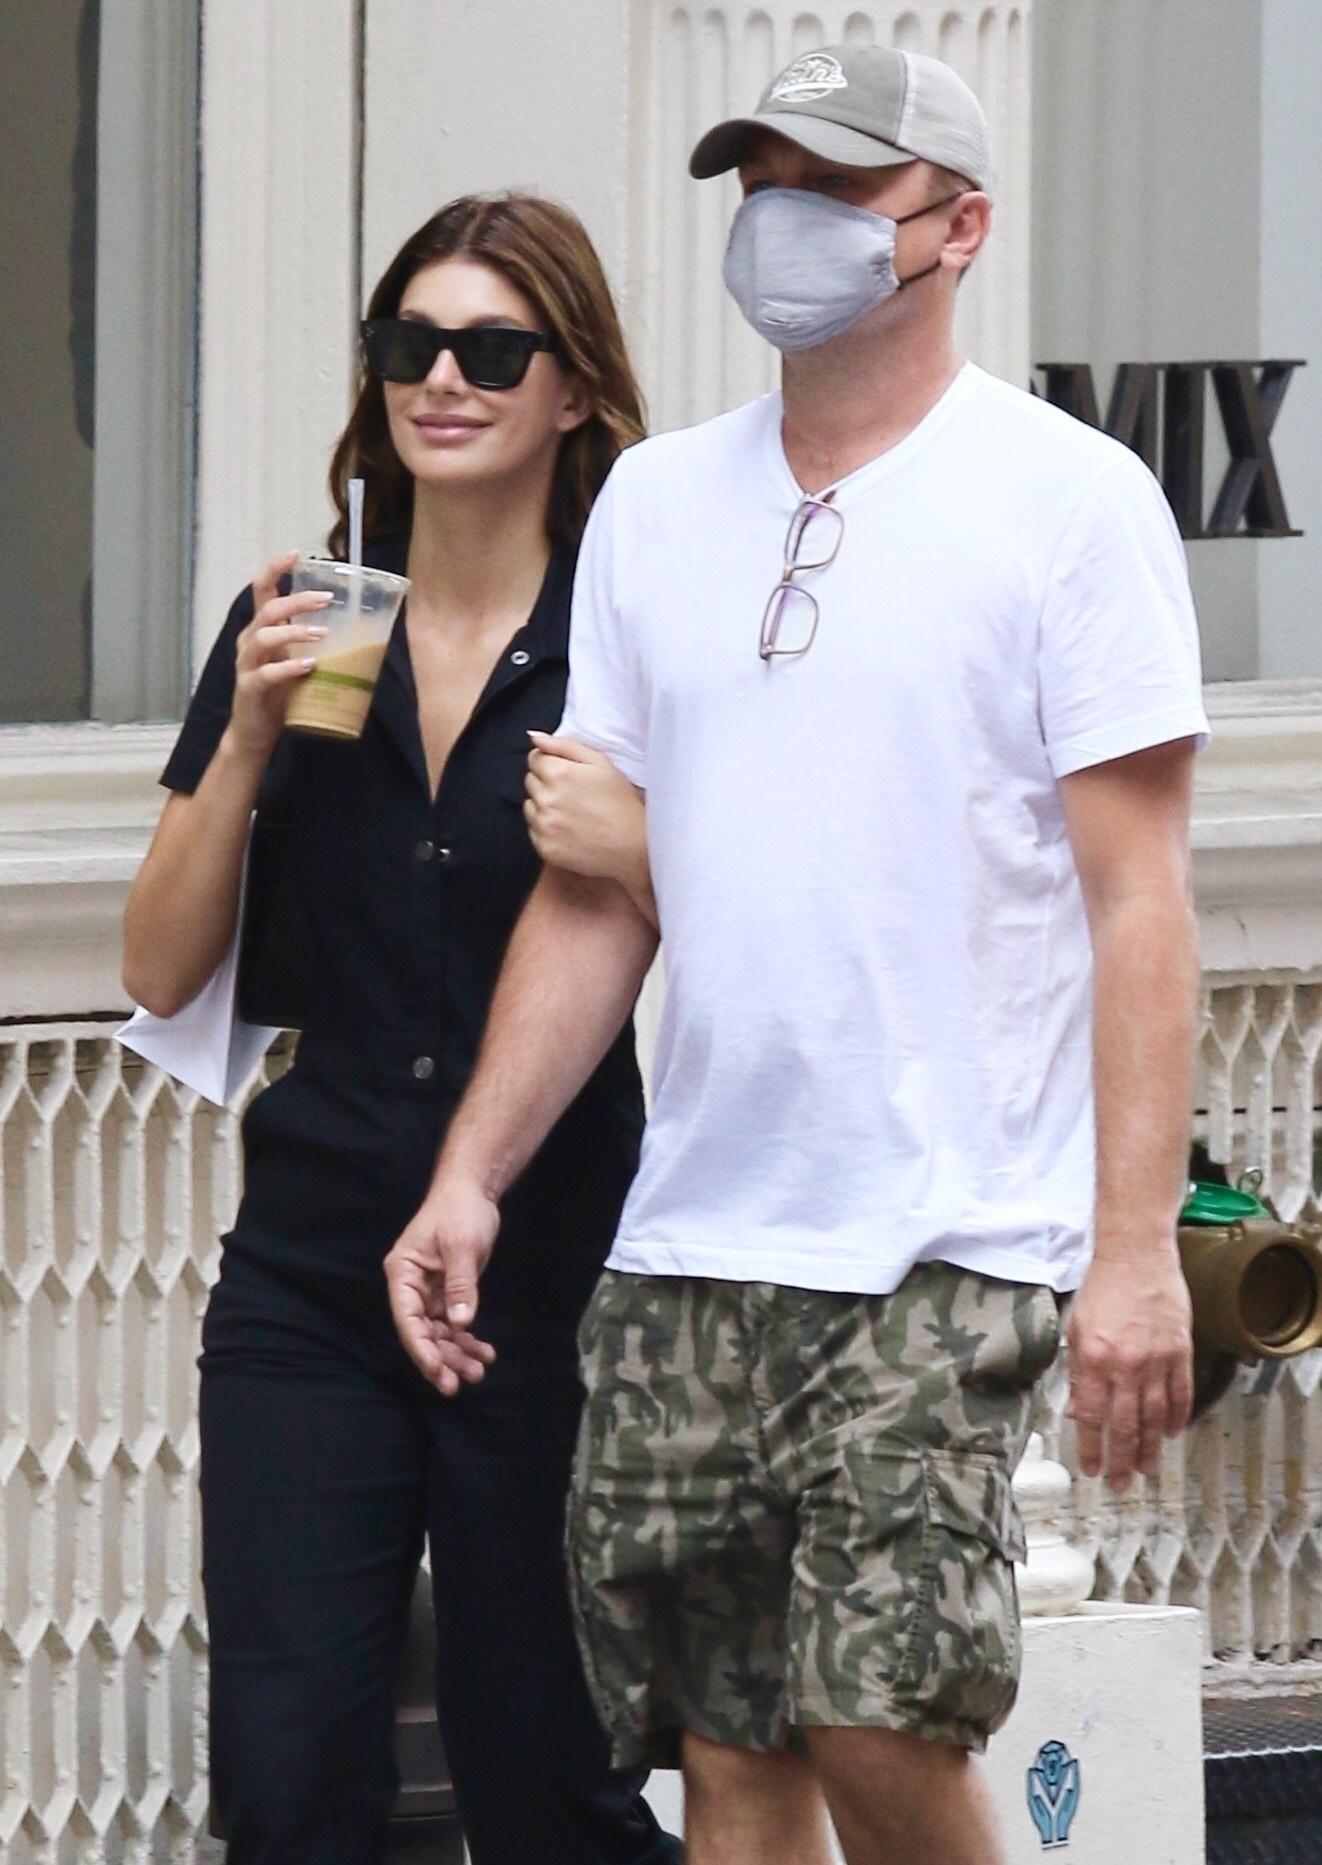 Leonardo DiCaprio & Camila Morrone Walk Arm-in-Arm During Shopping Spree in NYC